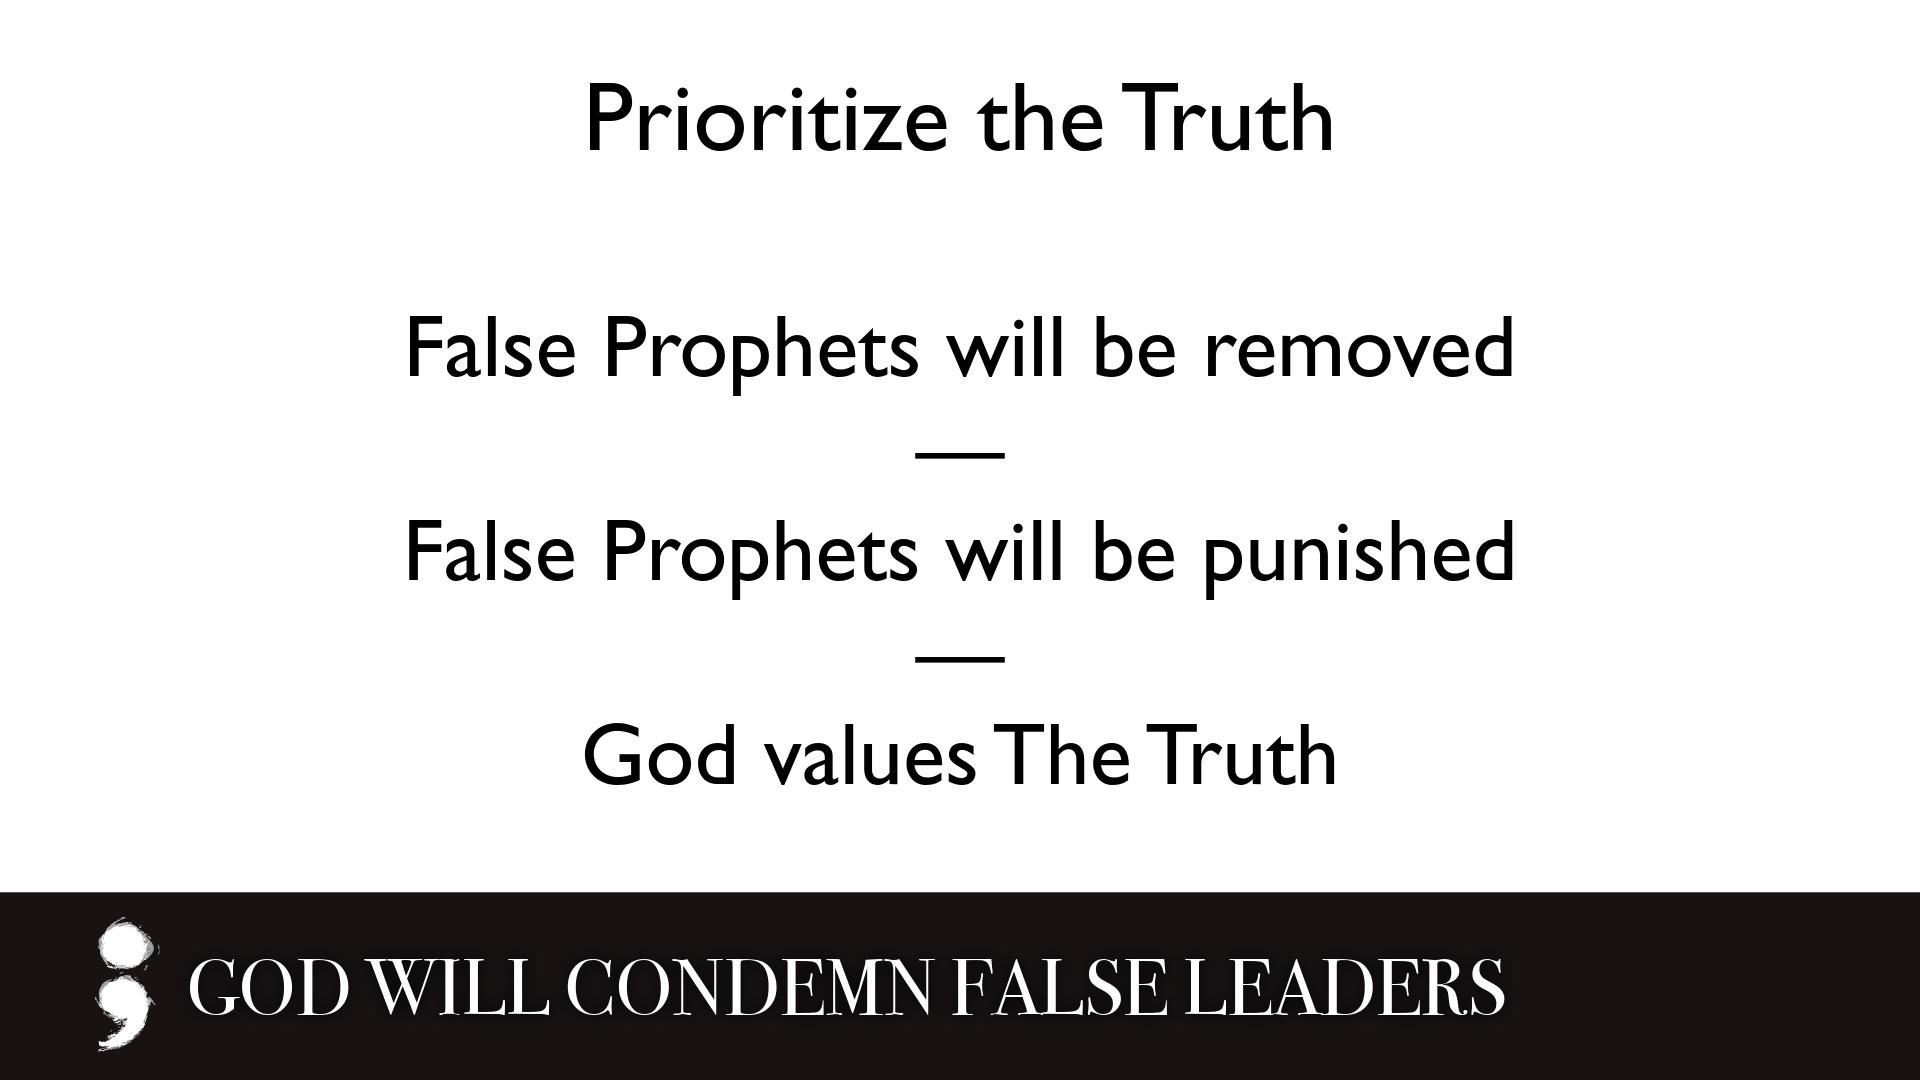 God will condemn false leaders.003.png